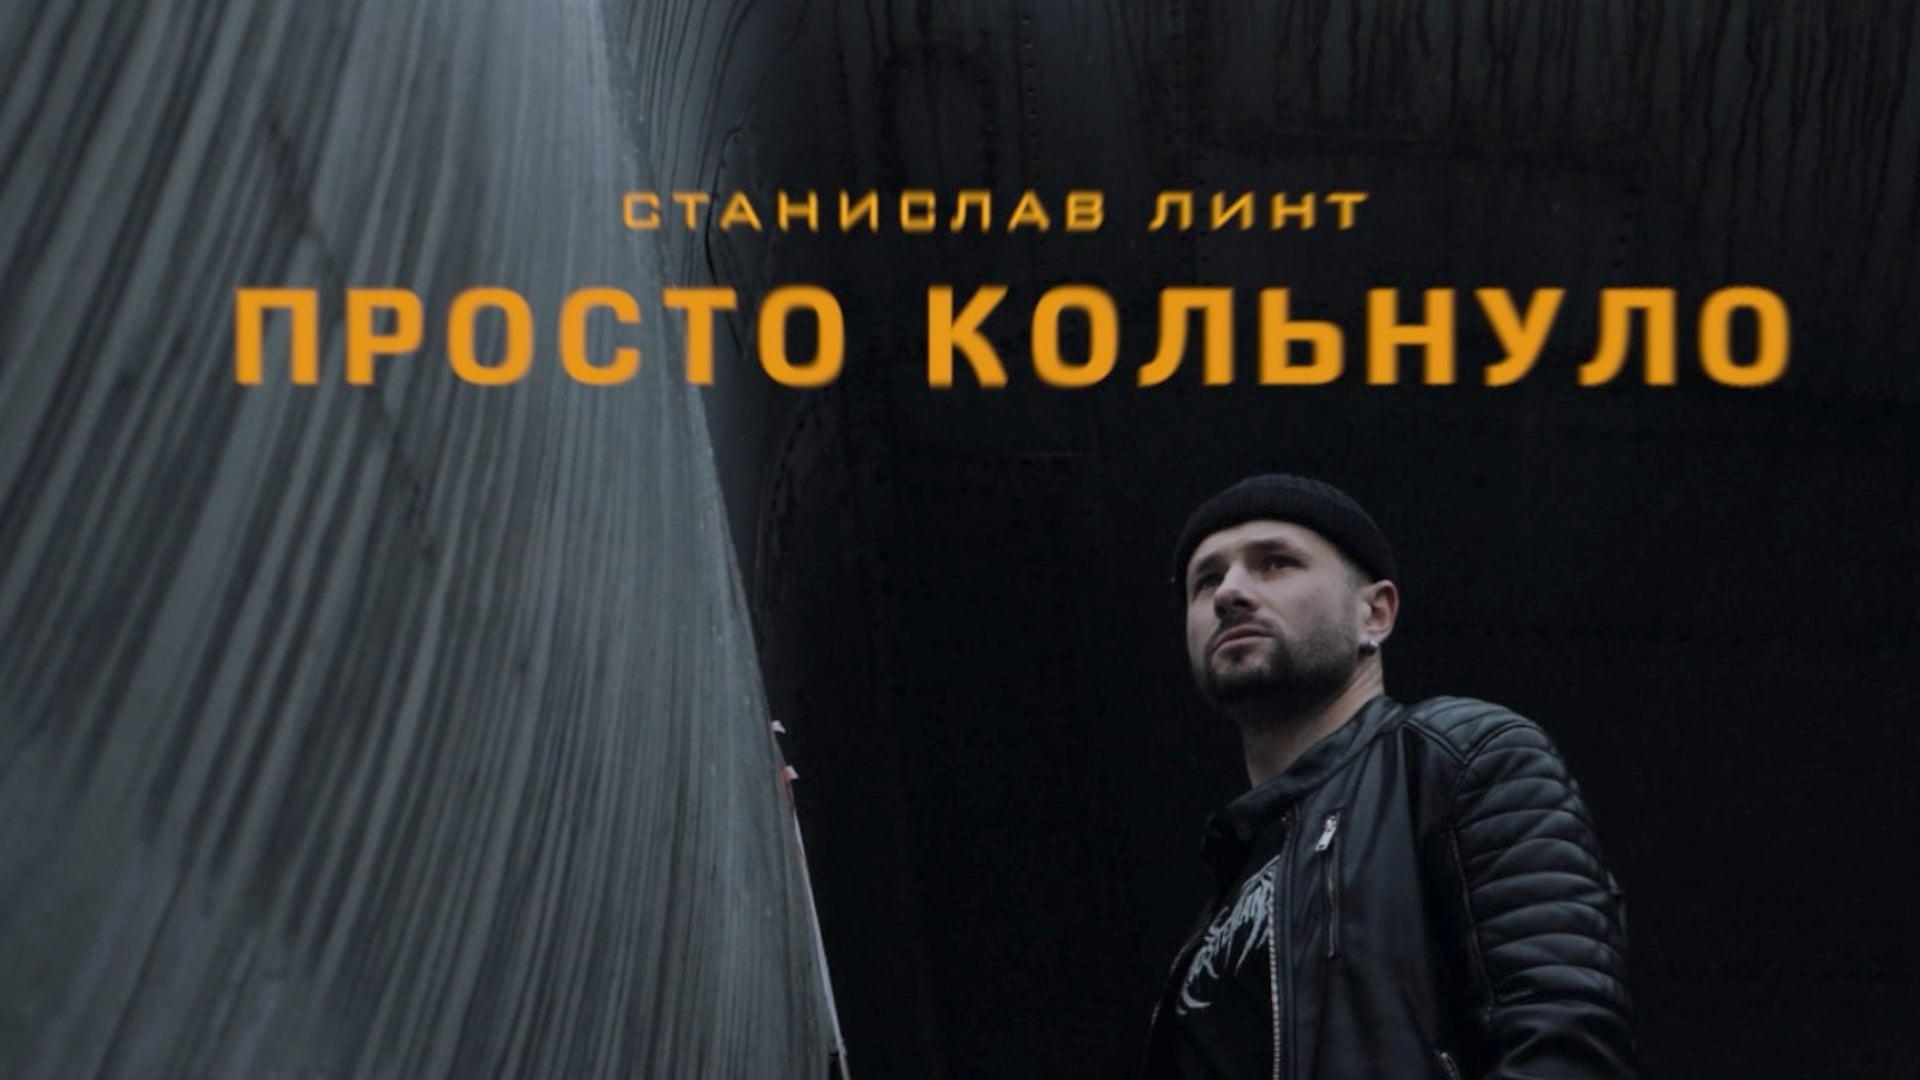 ЛИНТ - КОЛЬНУЛО